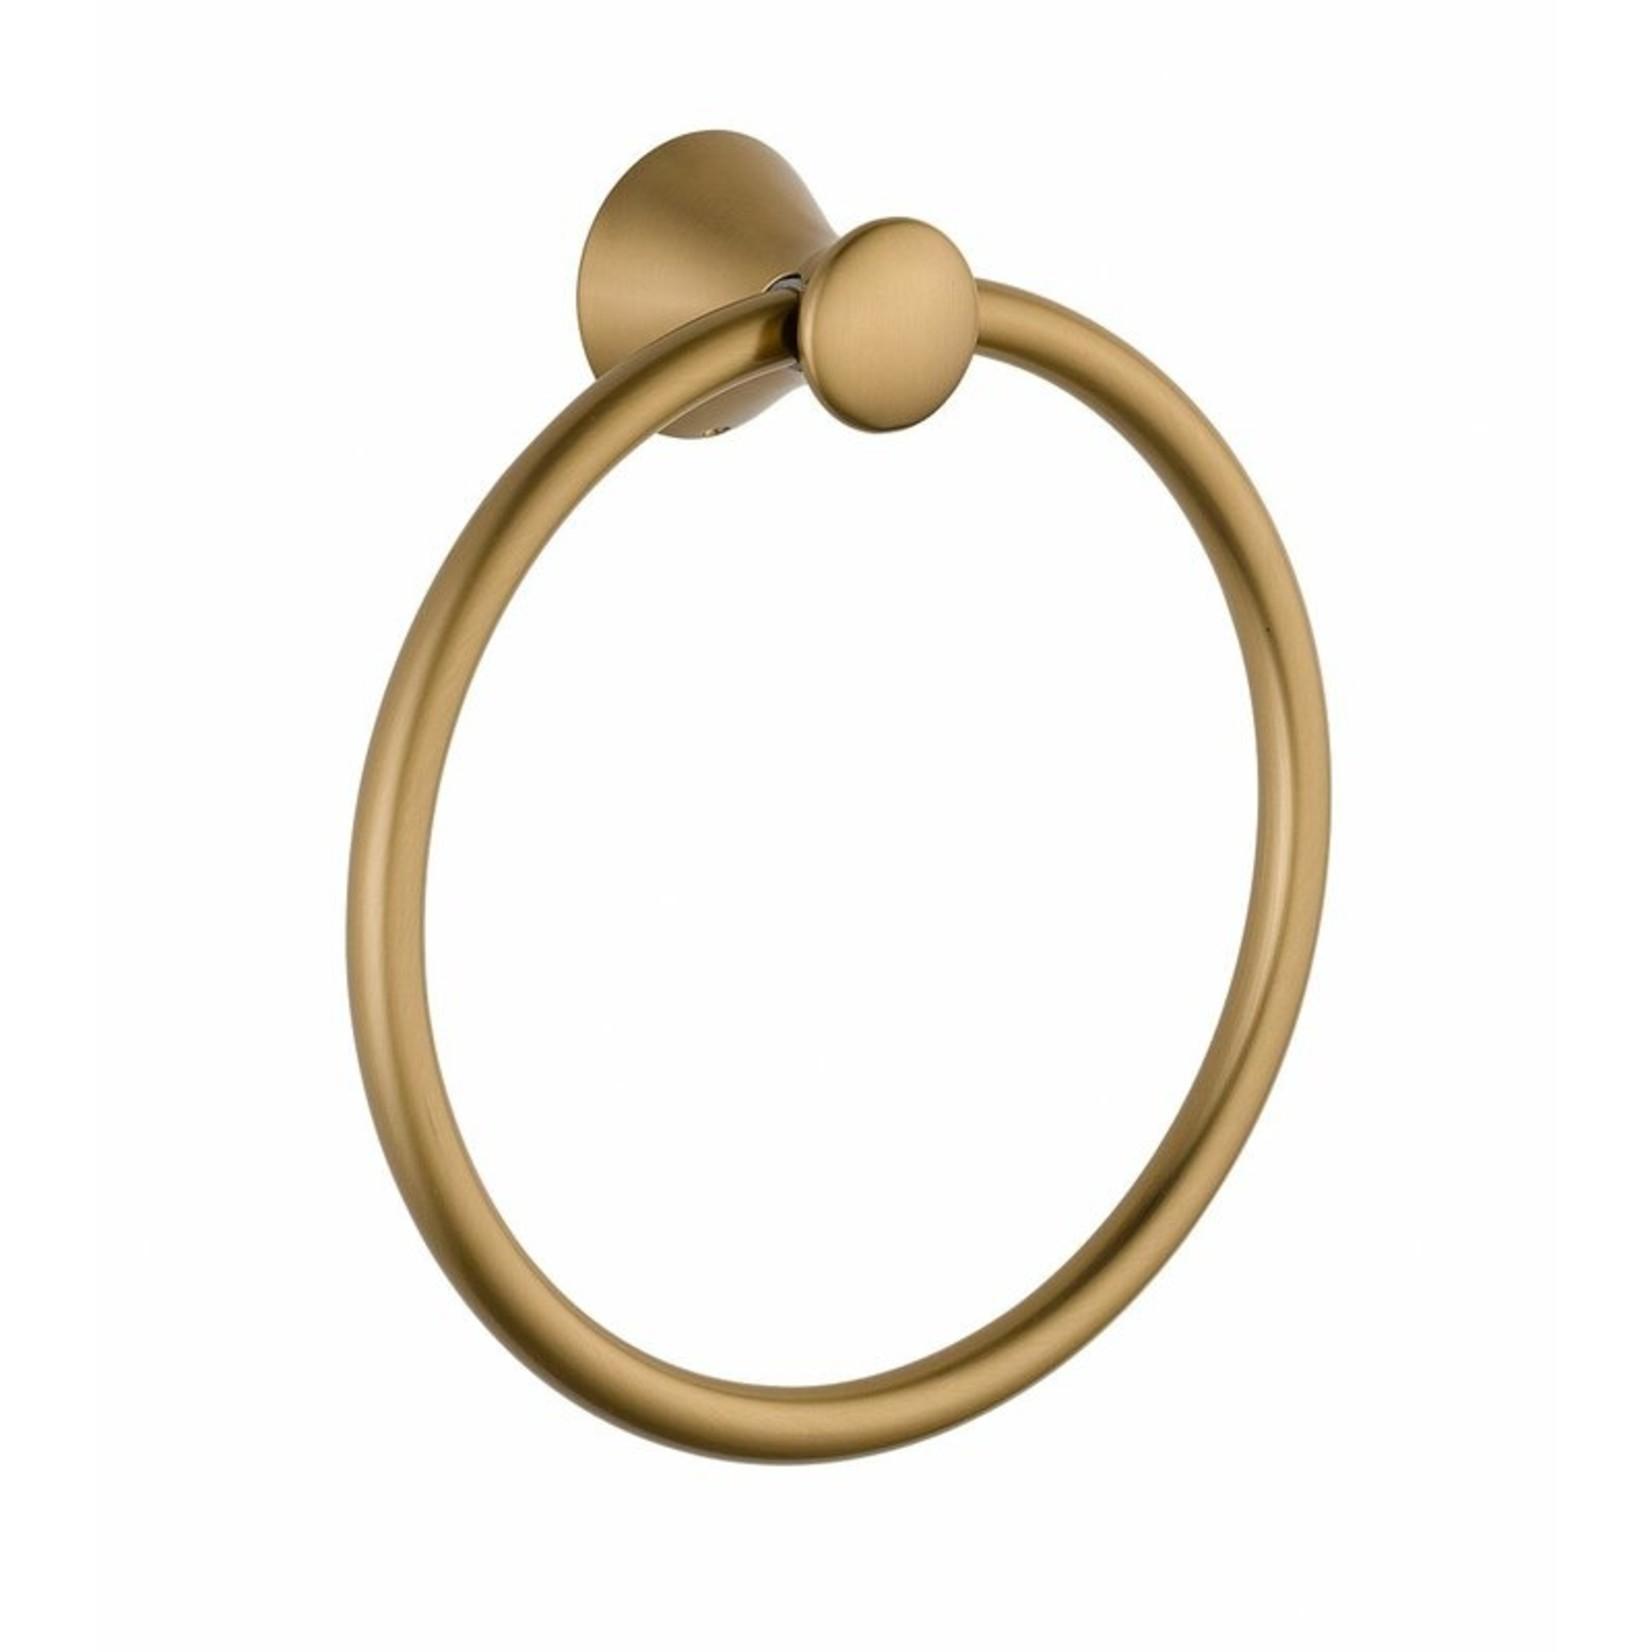 *Lahara Wall Mounted Towel Ring - Champagne Bronze Finish